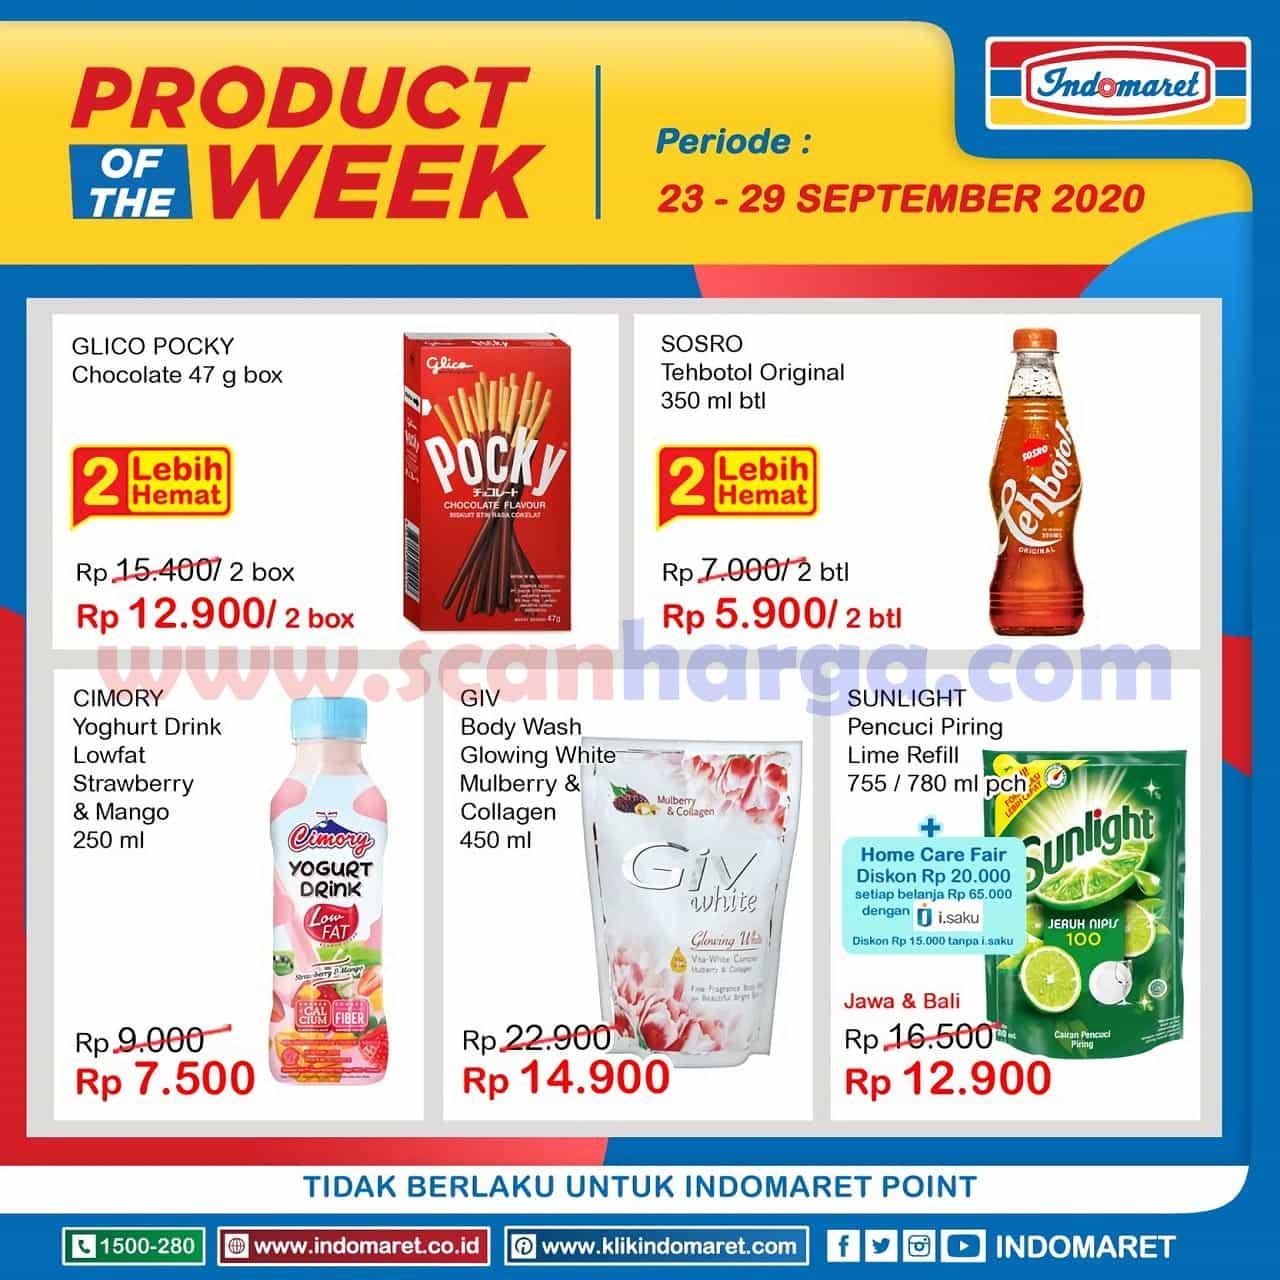 Katalog Indomaret Product Of The Week Promo PTW 23 - 29 September 2020